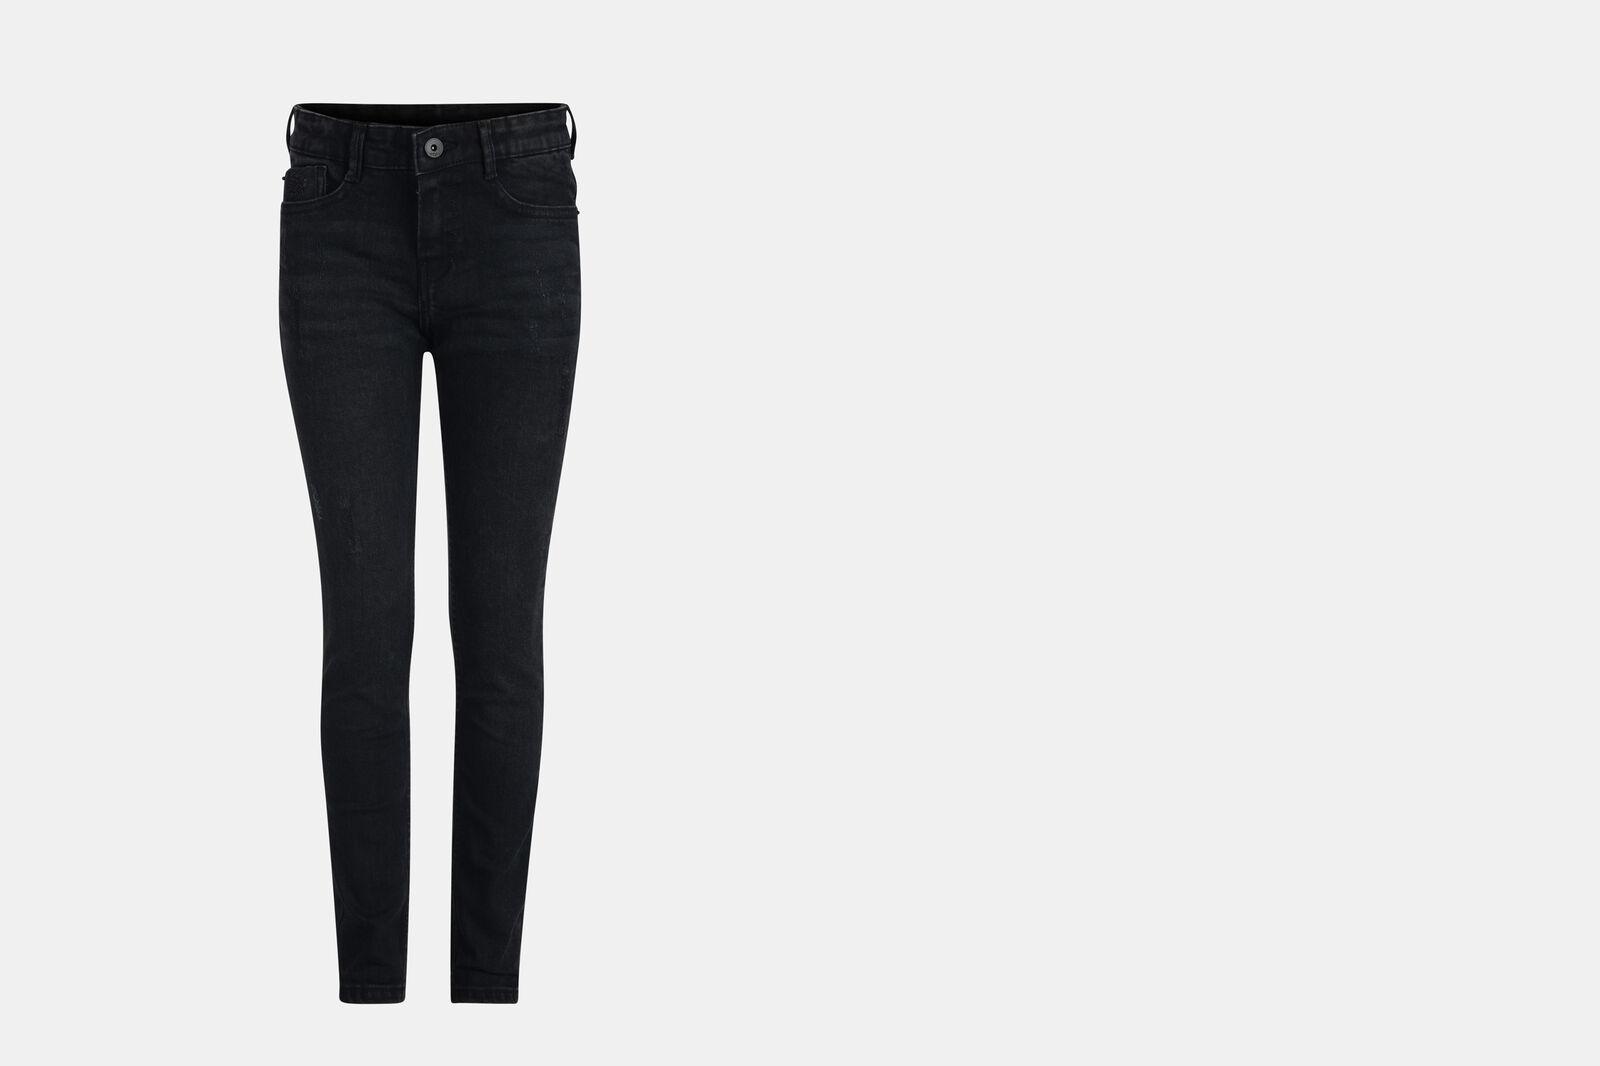 Brace Skinny Jeans